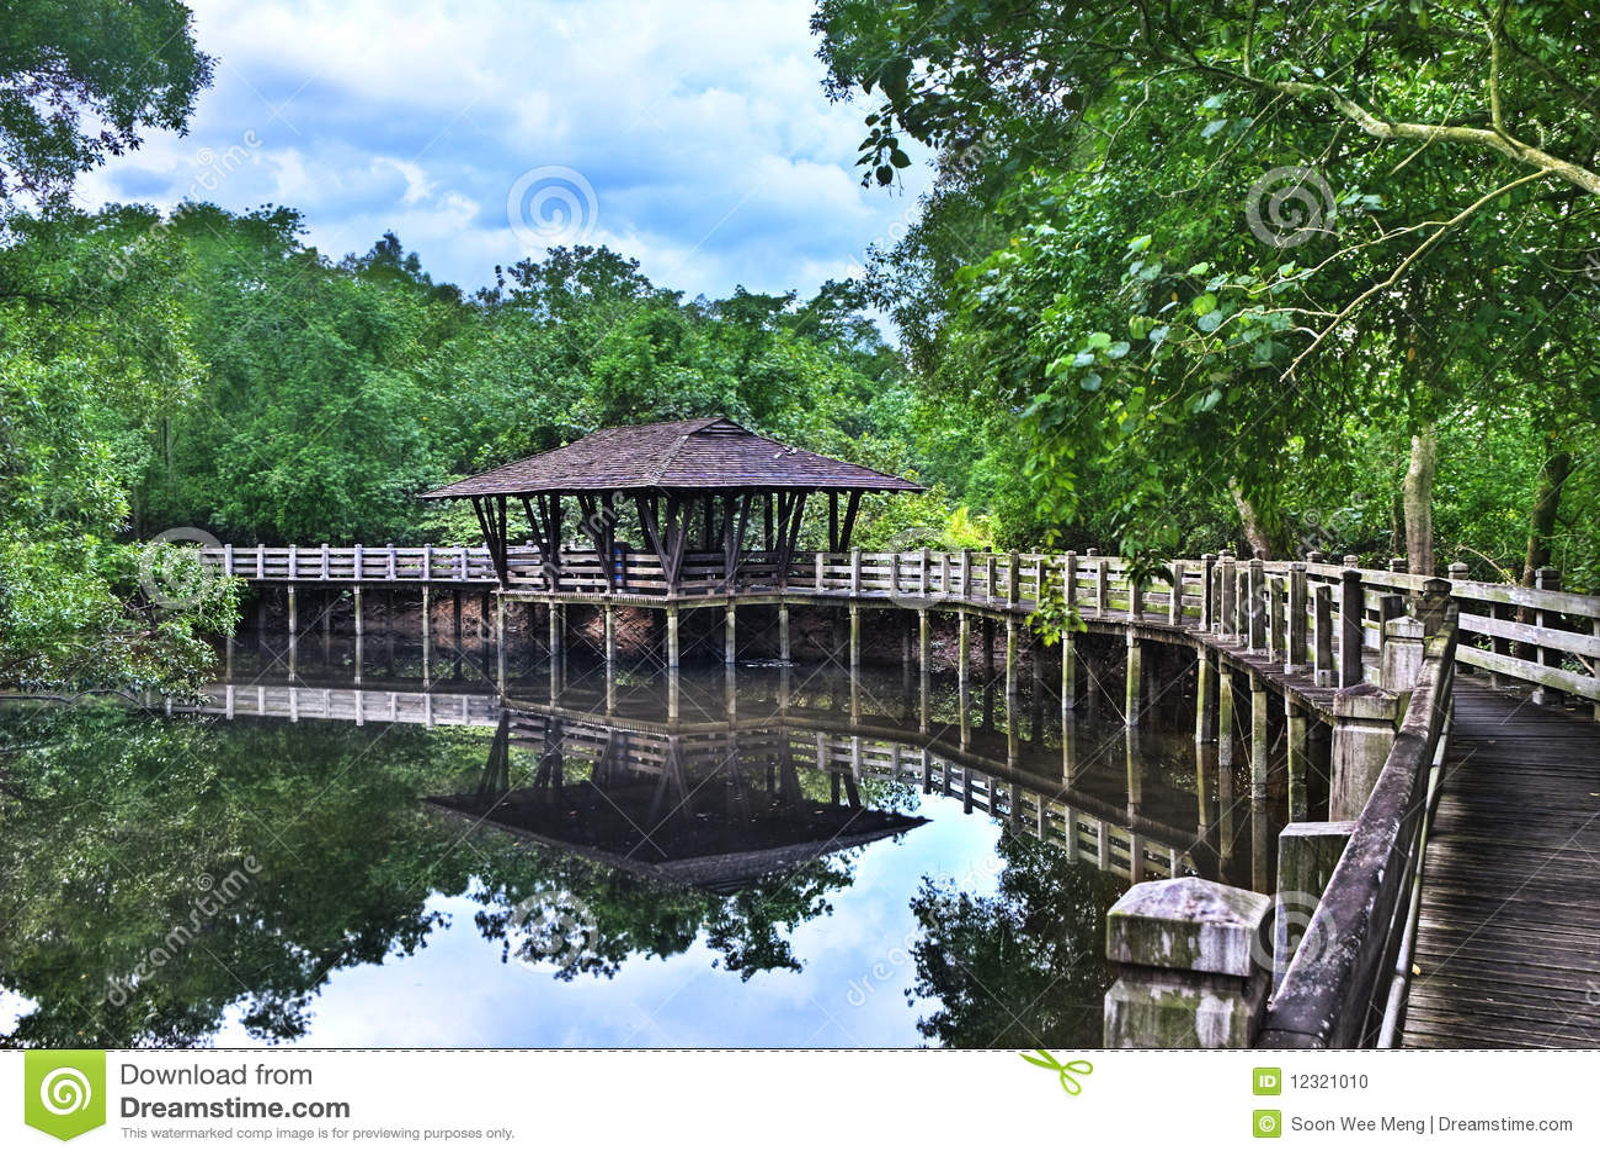 Mangrove Arboretum Shelter, Sungei Buloh Singapore